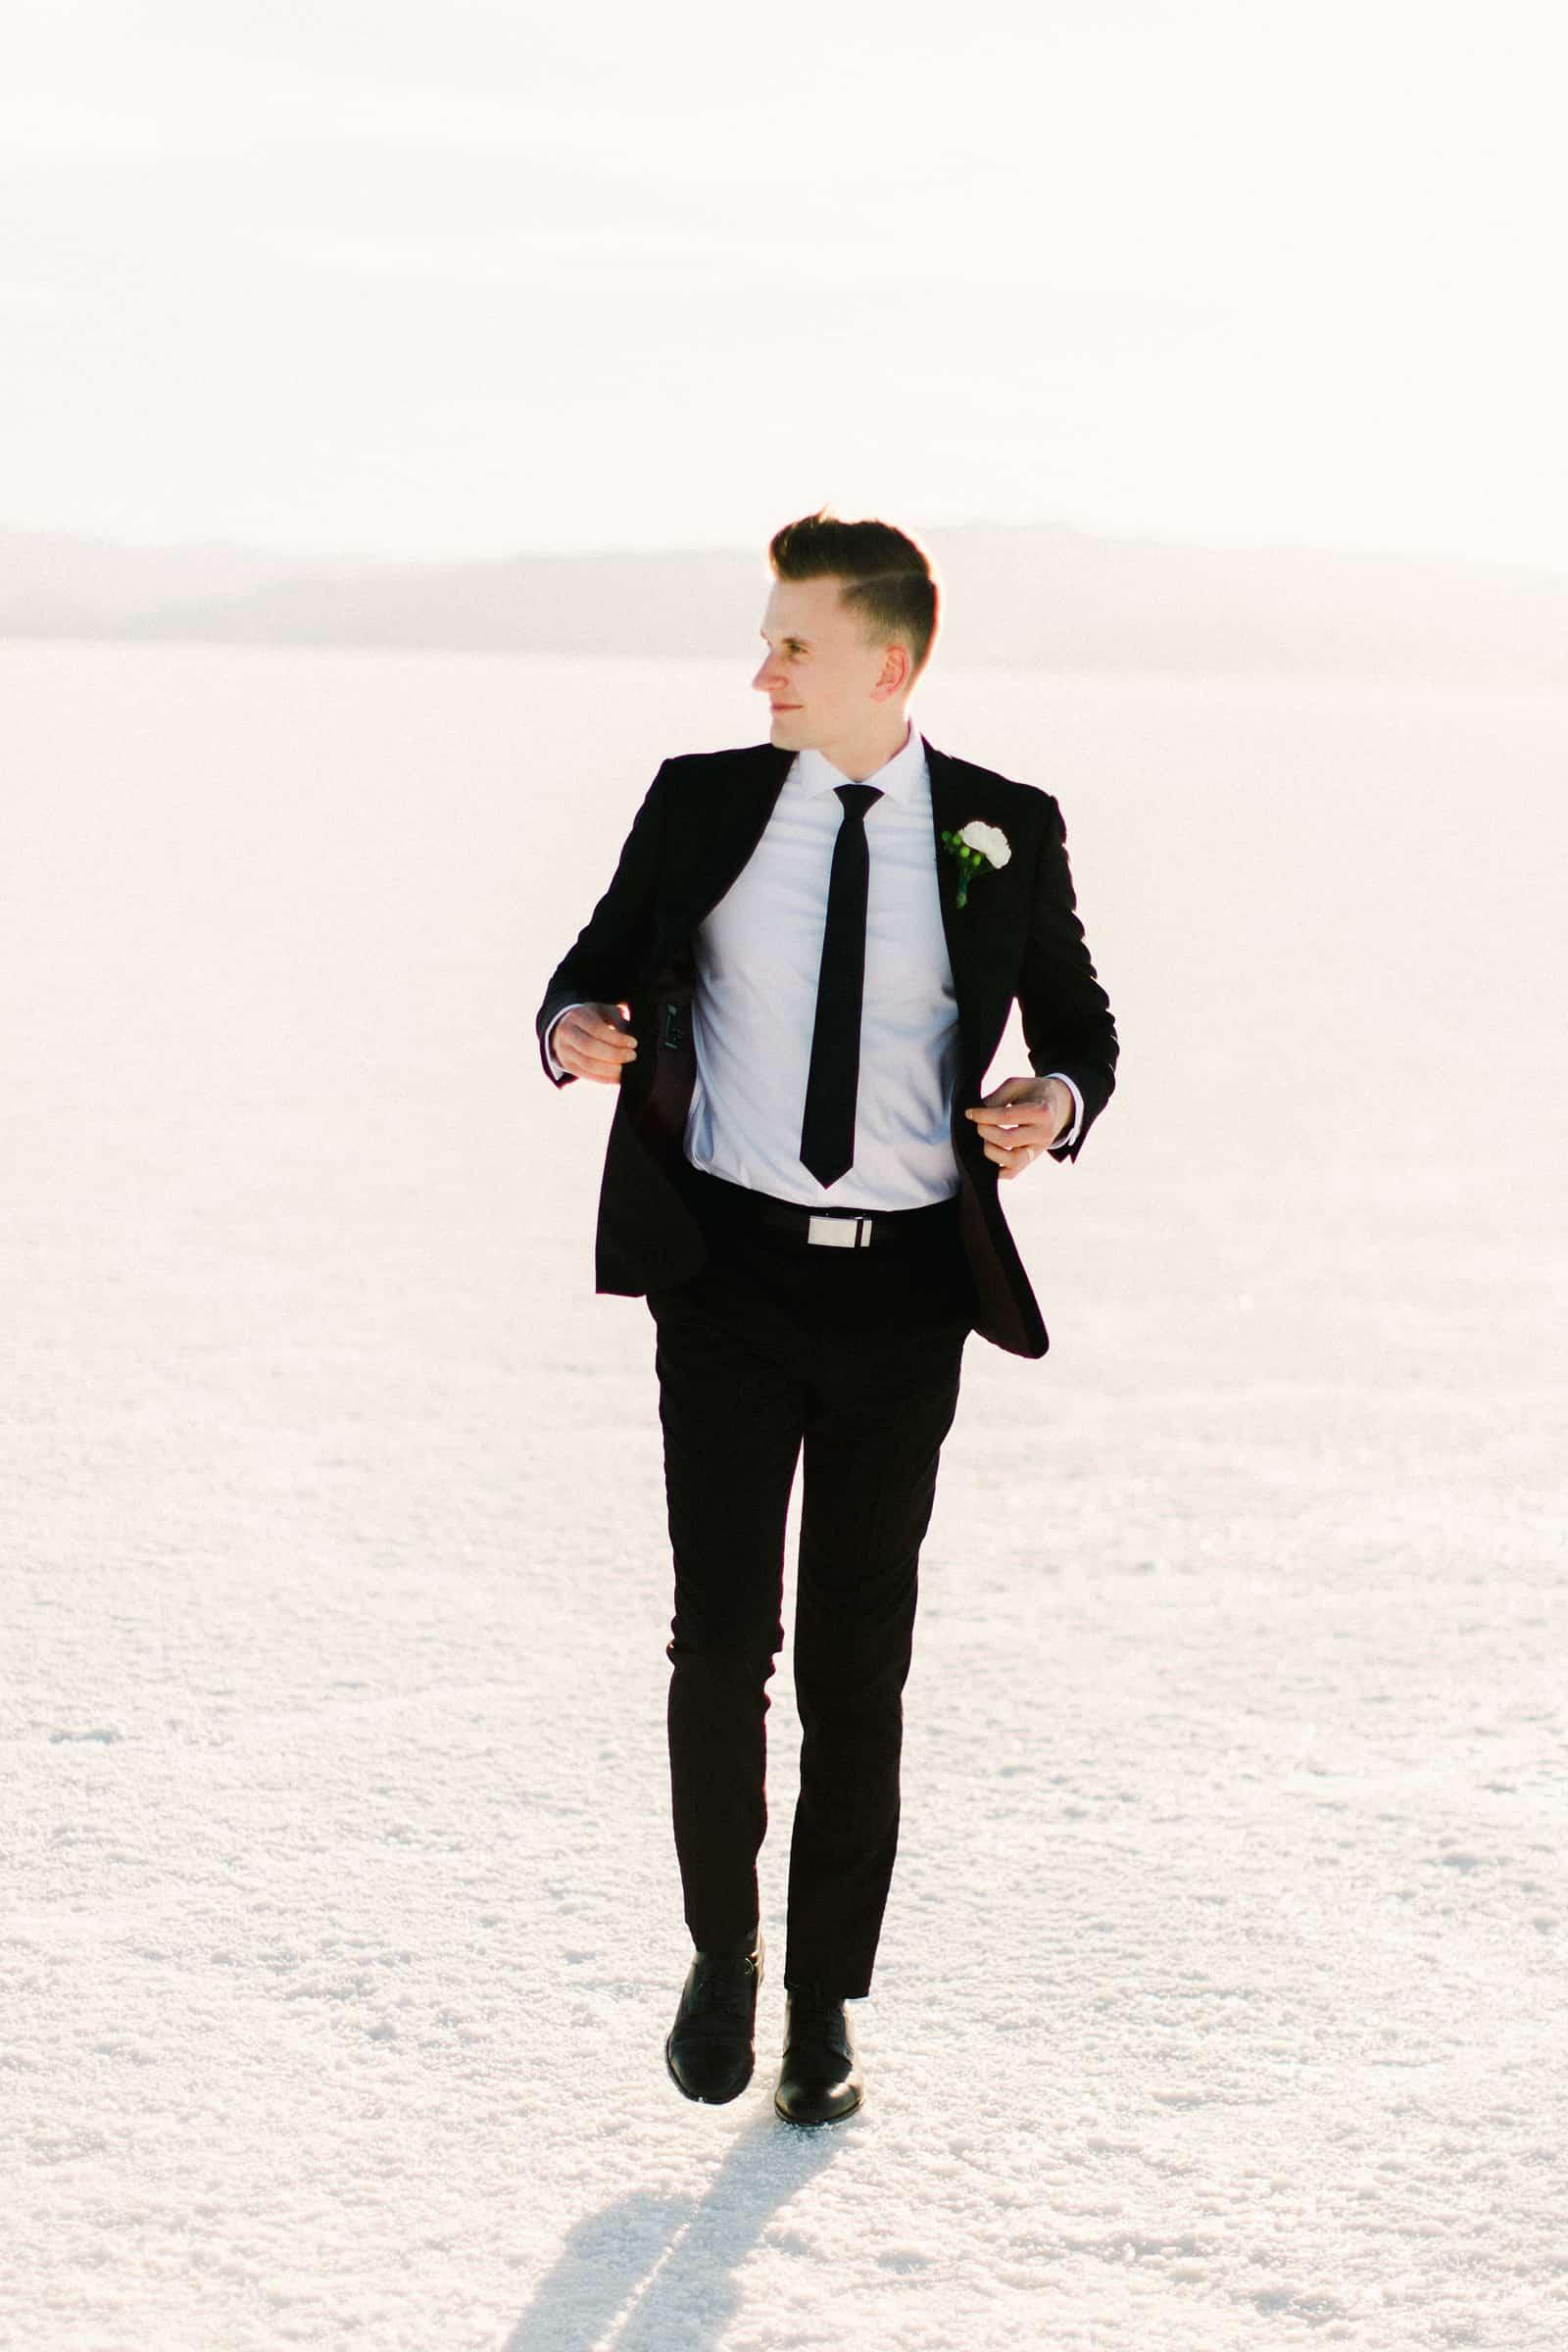 Bonneville Salt Flats Utah Wedding Photography, destination wedding, groom in classic black suit and black tie